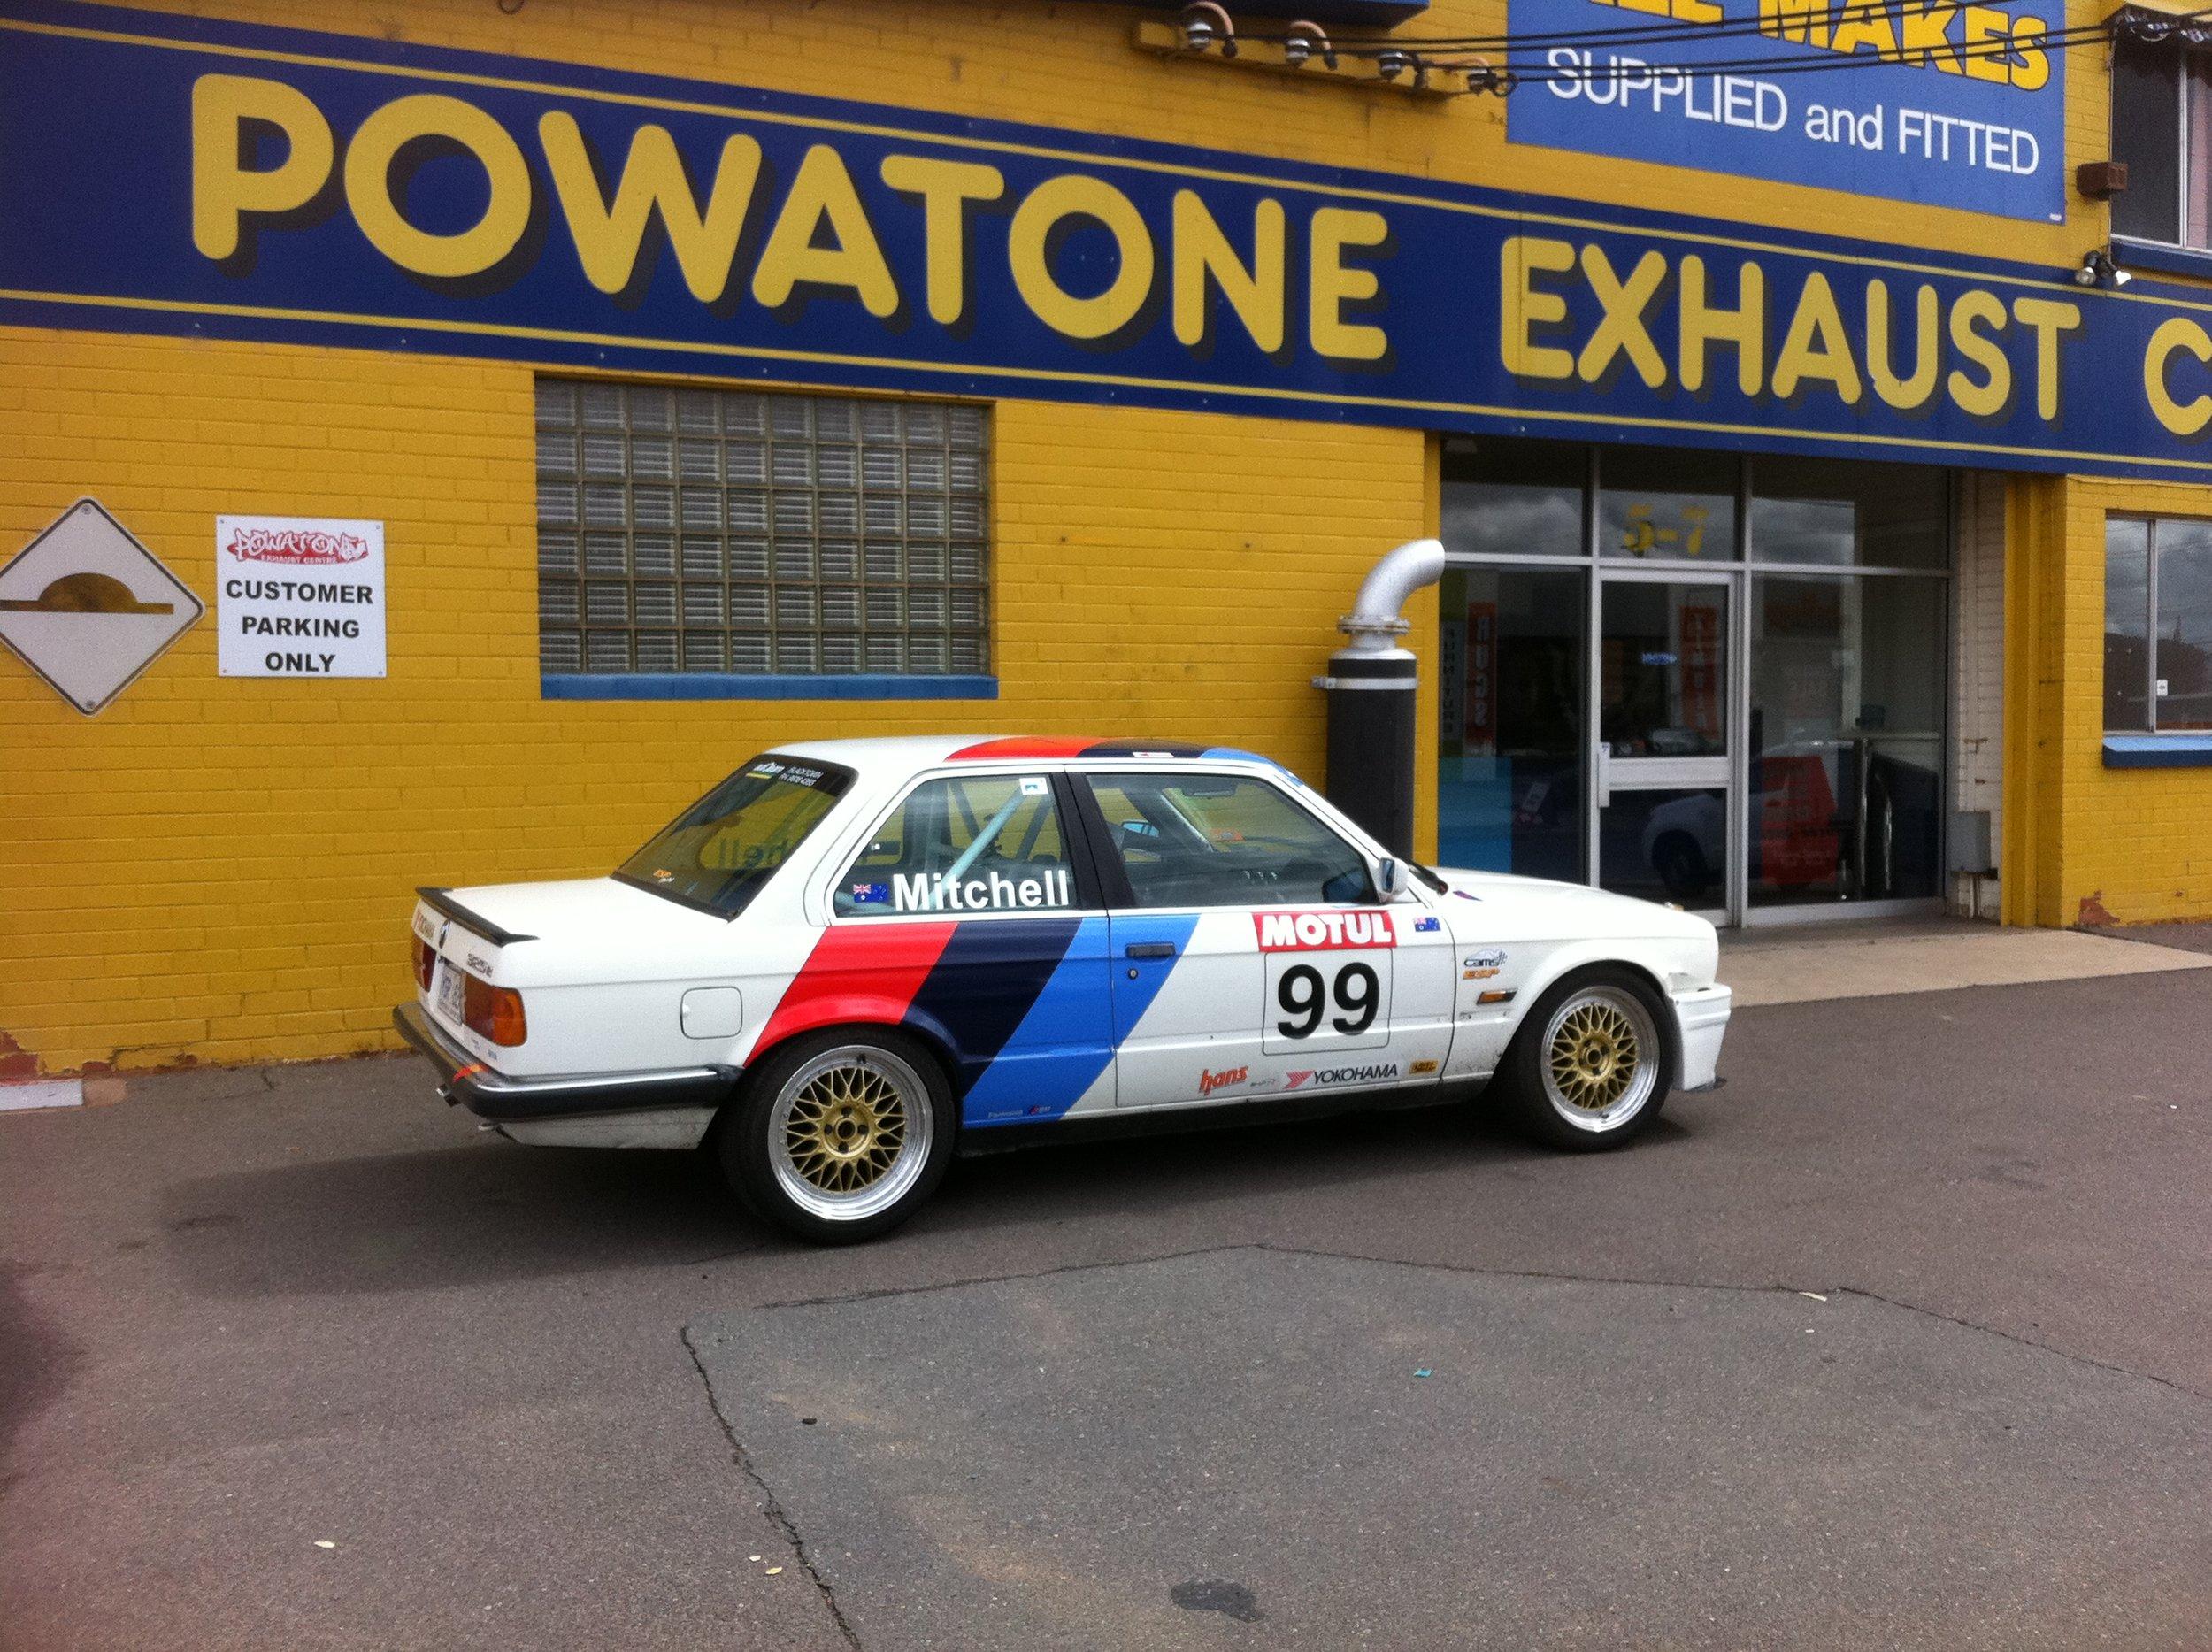 powatone exhaust centre old workshop collie st.jpg